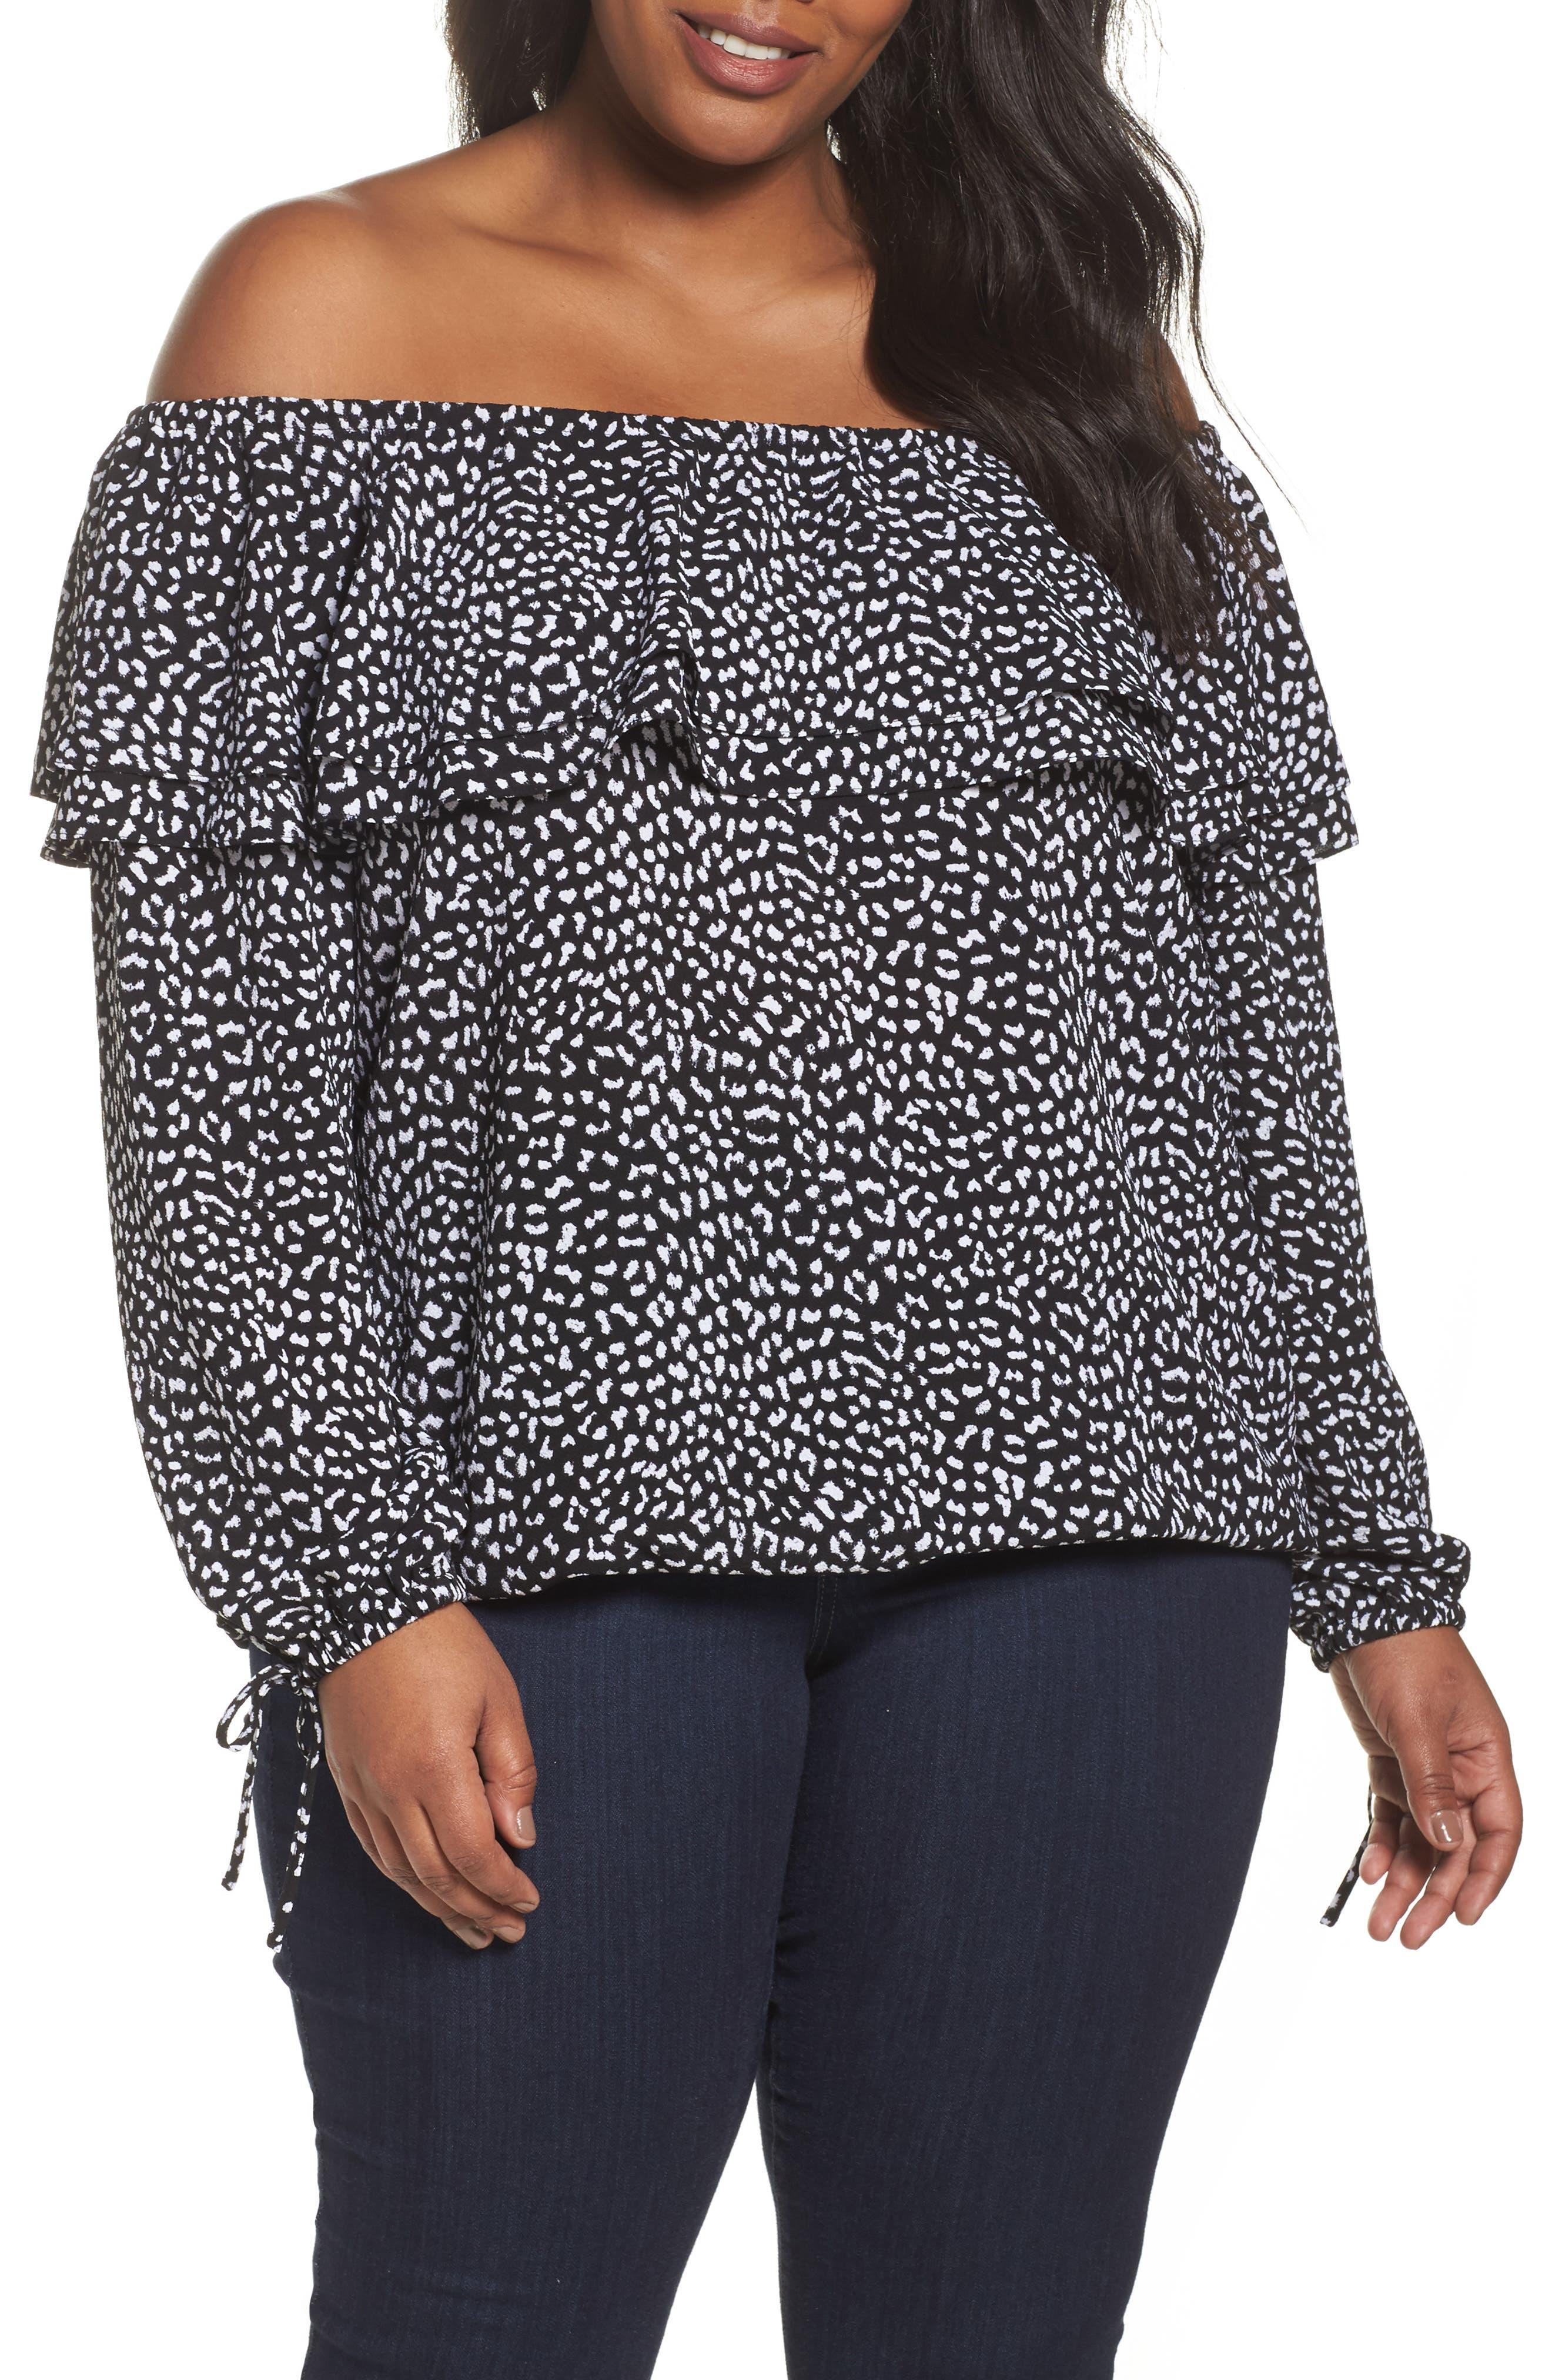 Cheetah Print Off the Shoulder Top,                         Main,                         color, Black